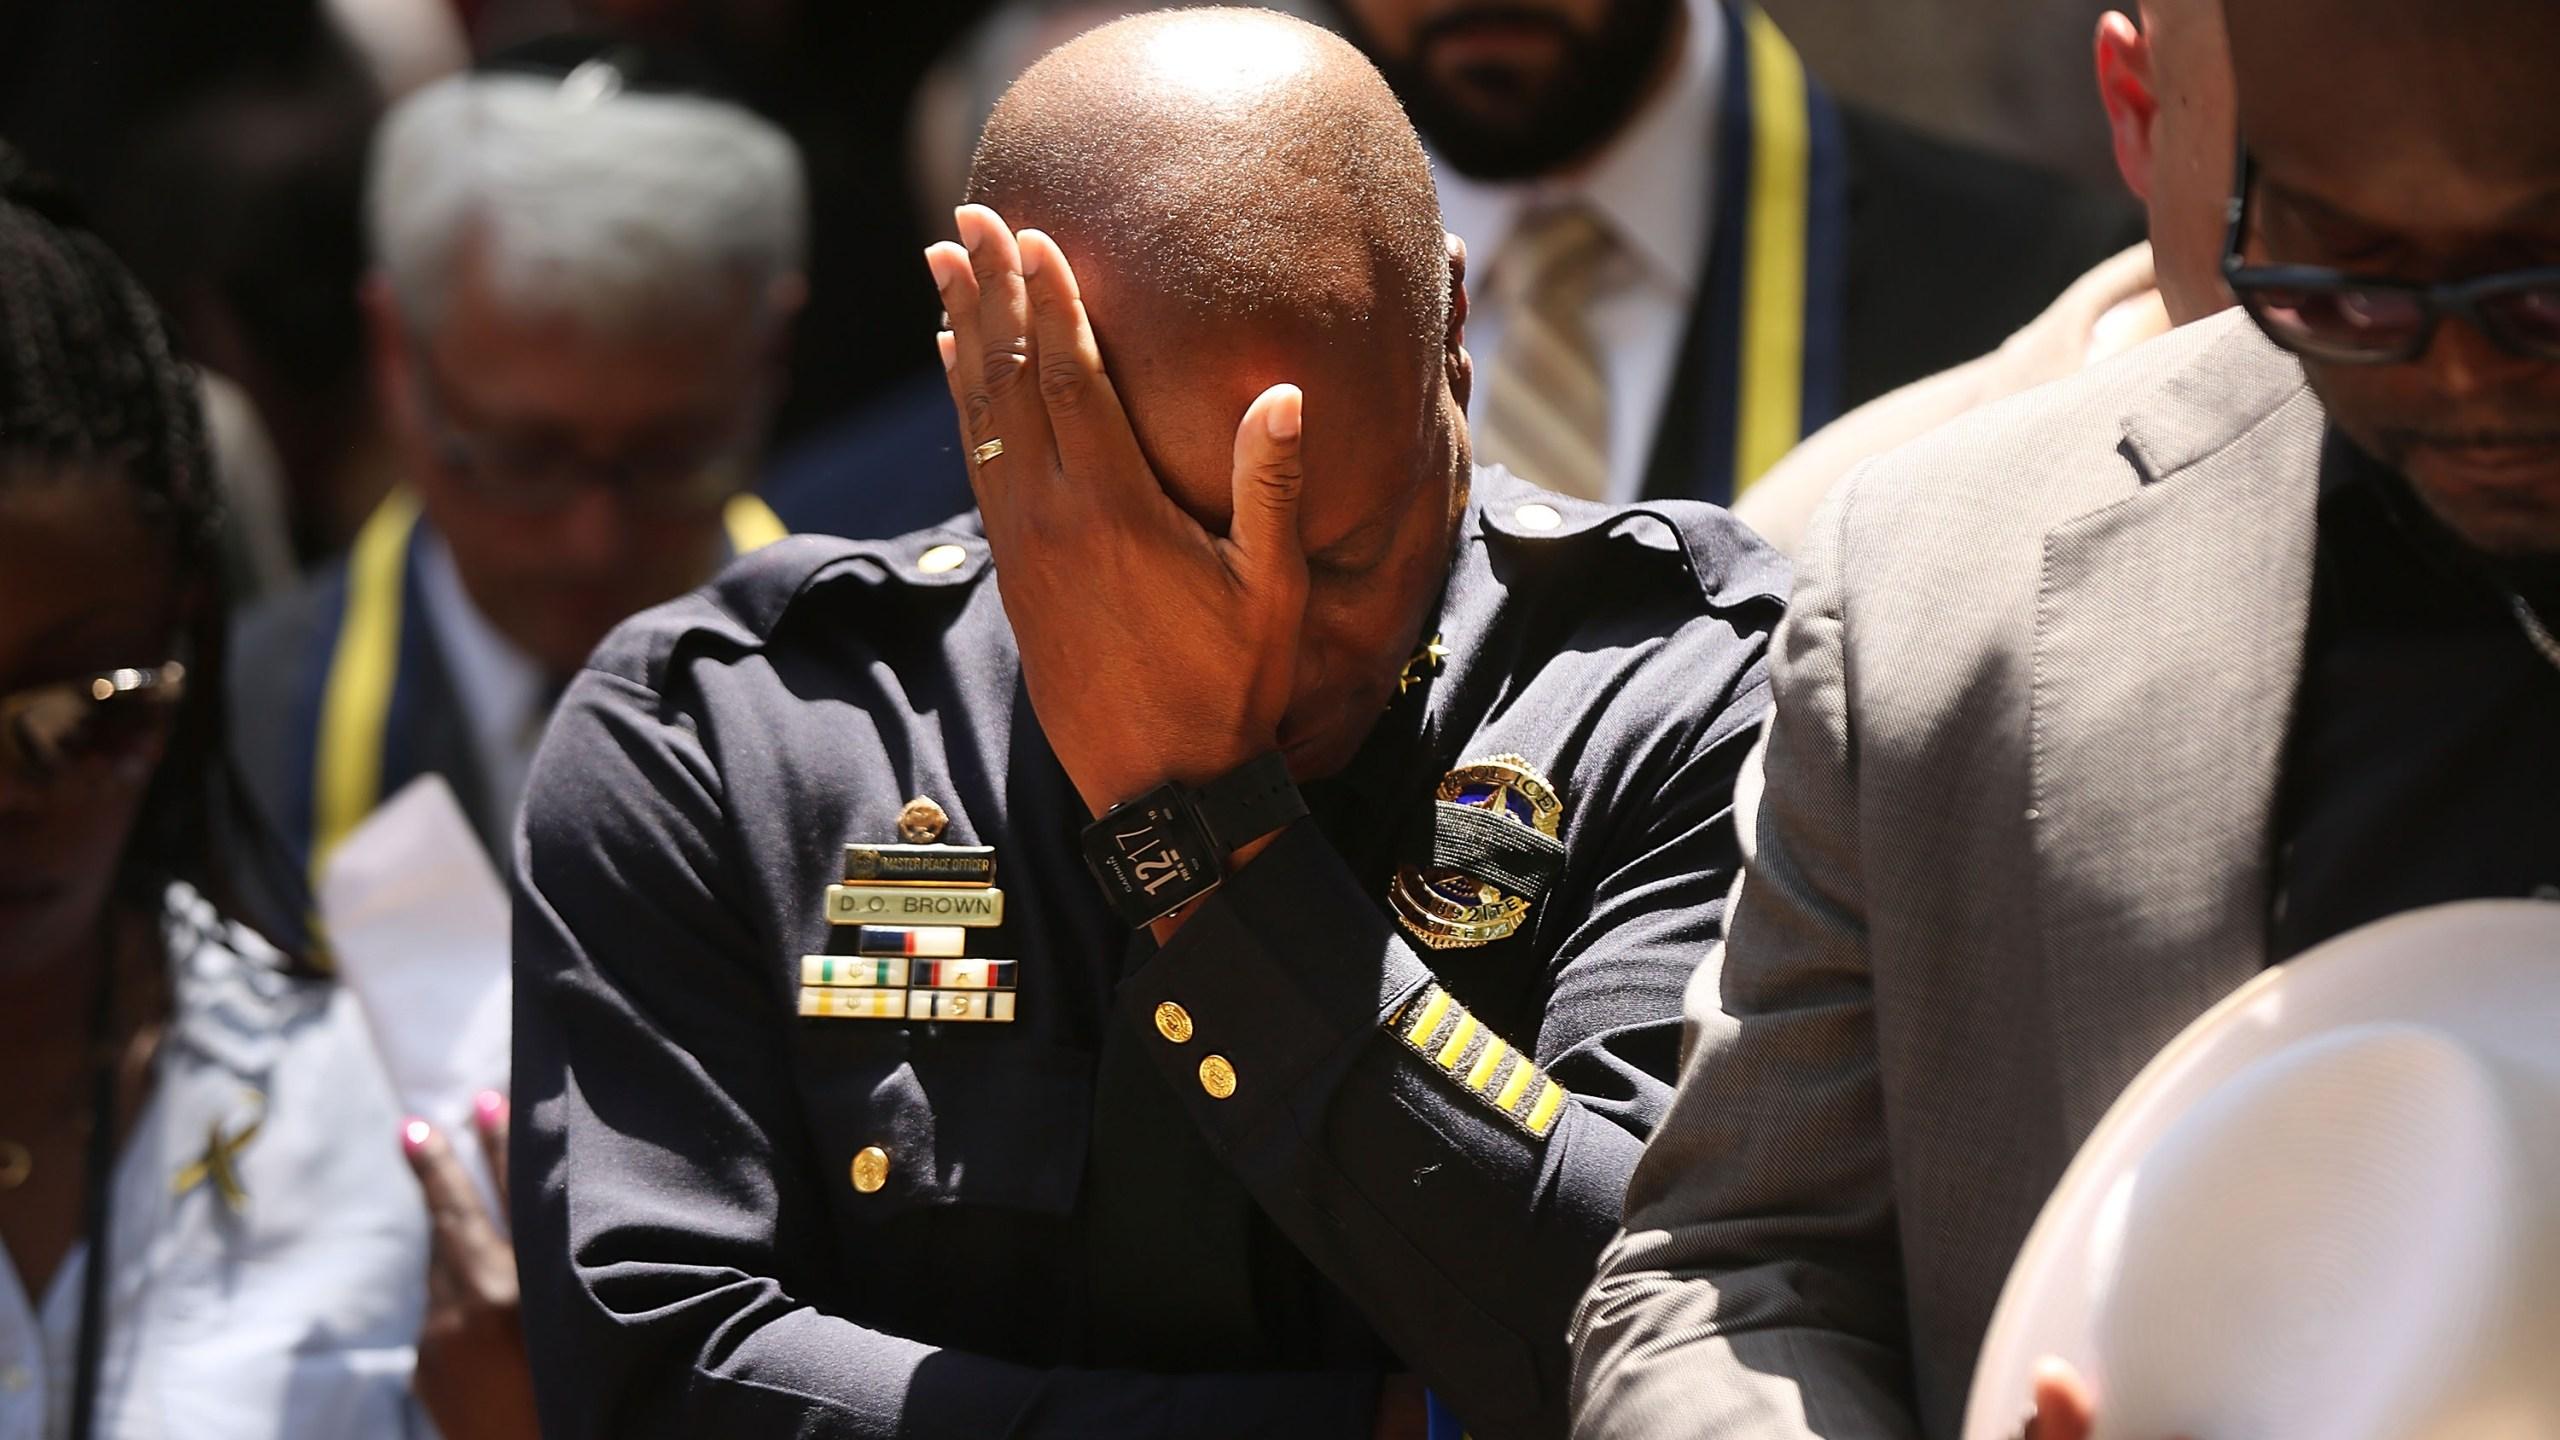 Dallas Police Chief David Brown pauses at a prayer vigil